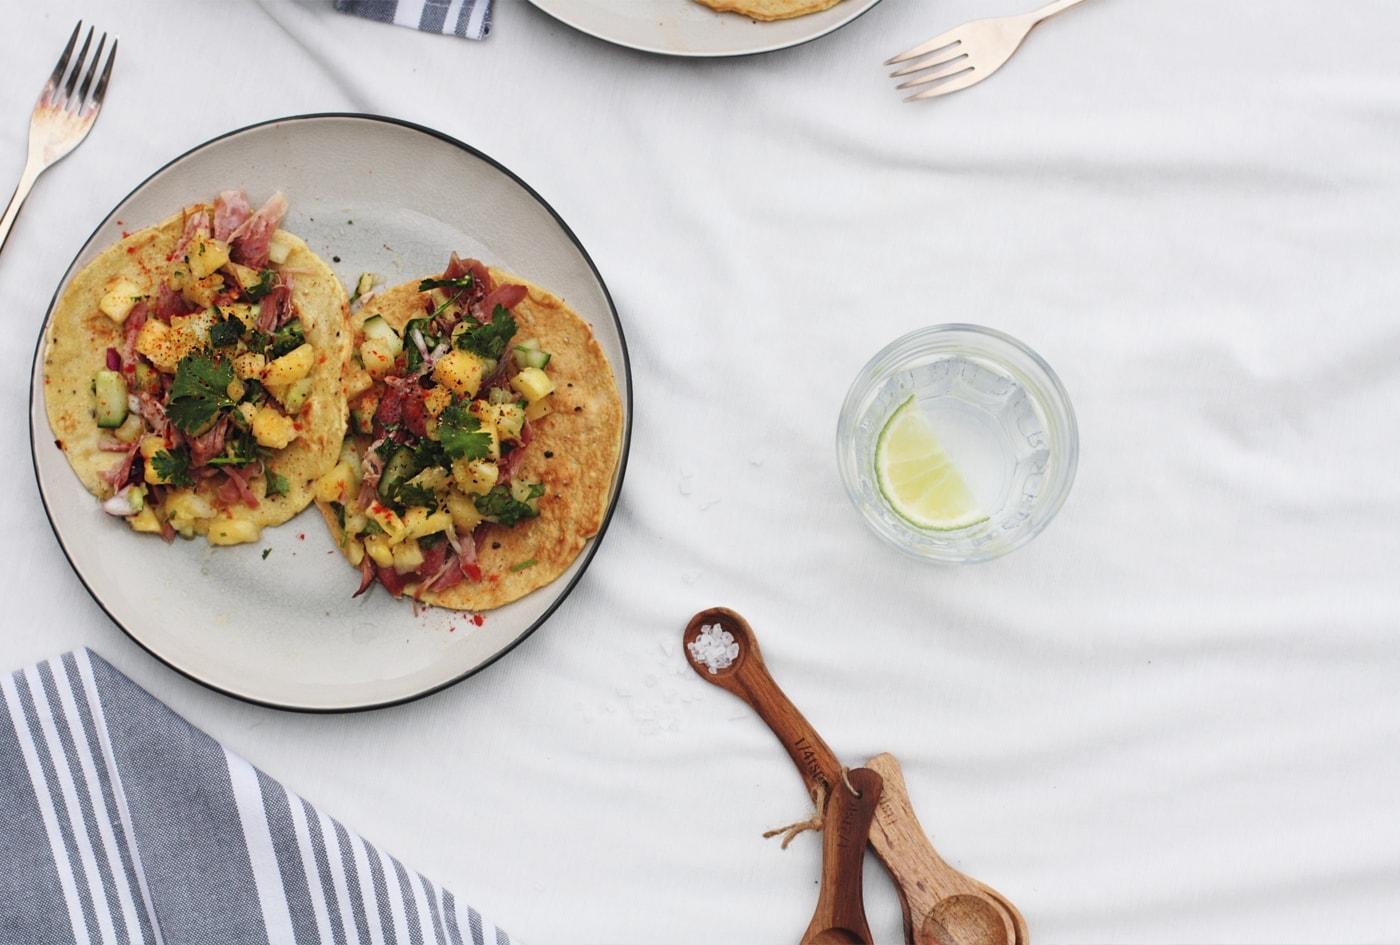 Paleo ham tacos with pineapple salsa   gluten free   grain free   dairy free   dinner recipes